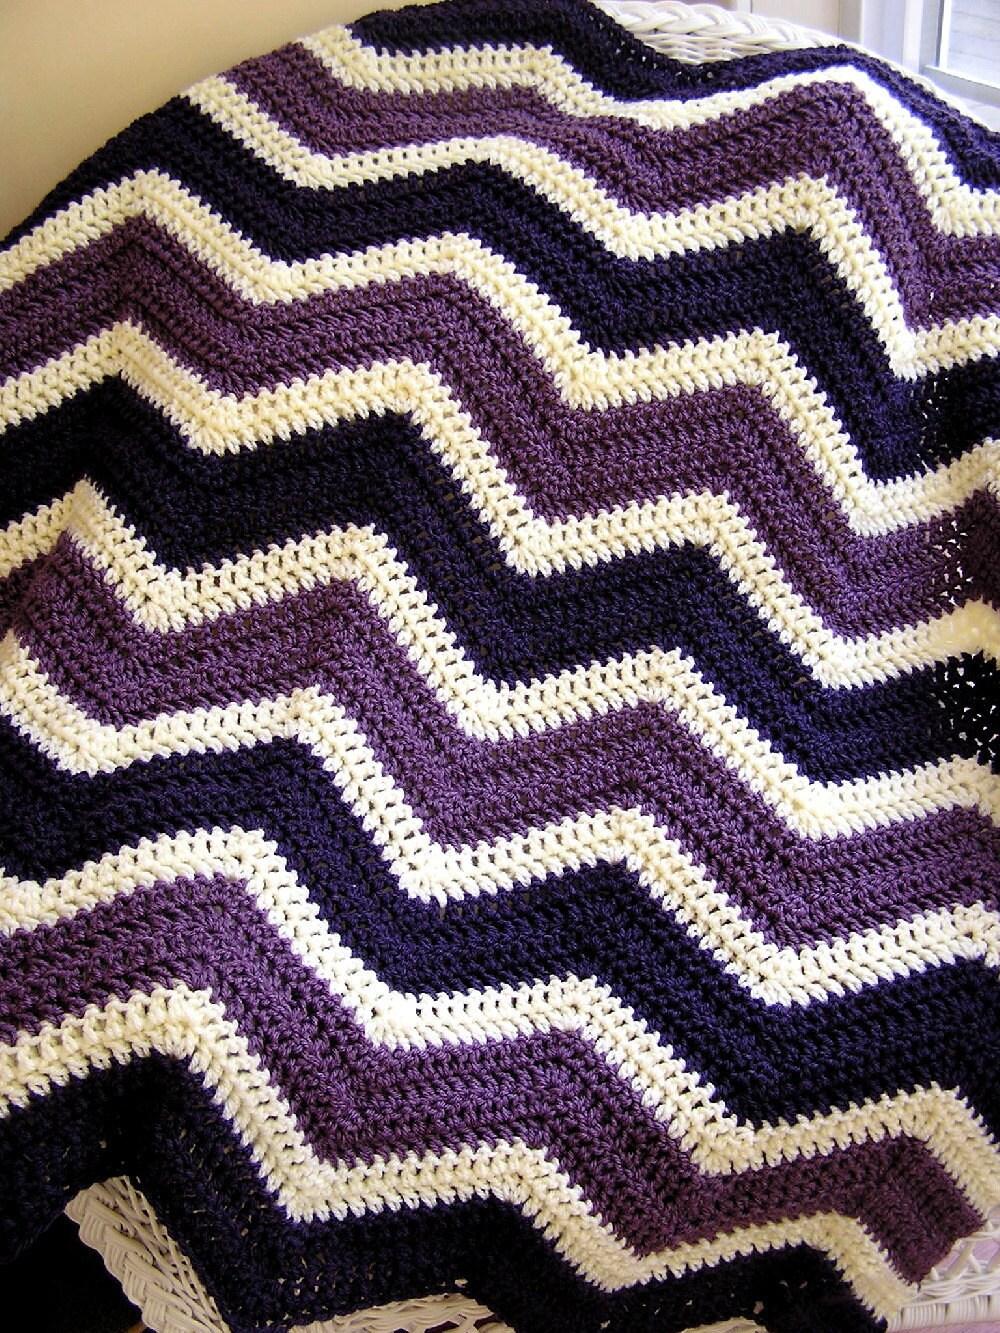 Knitting Pattern For Chevron Afghan : new chevron zig zag baby blanket crochet knit baby afghan lap